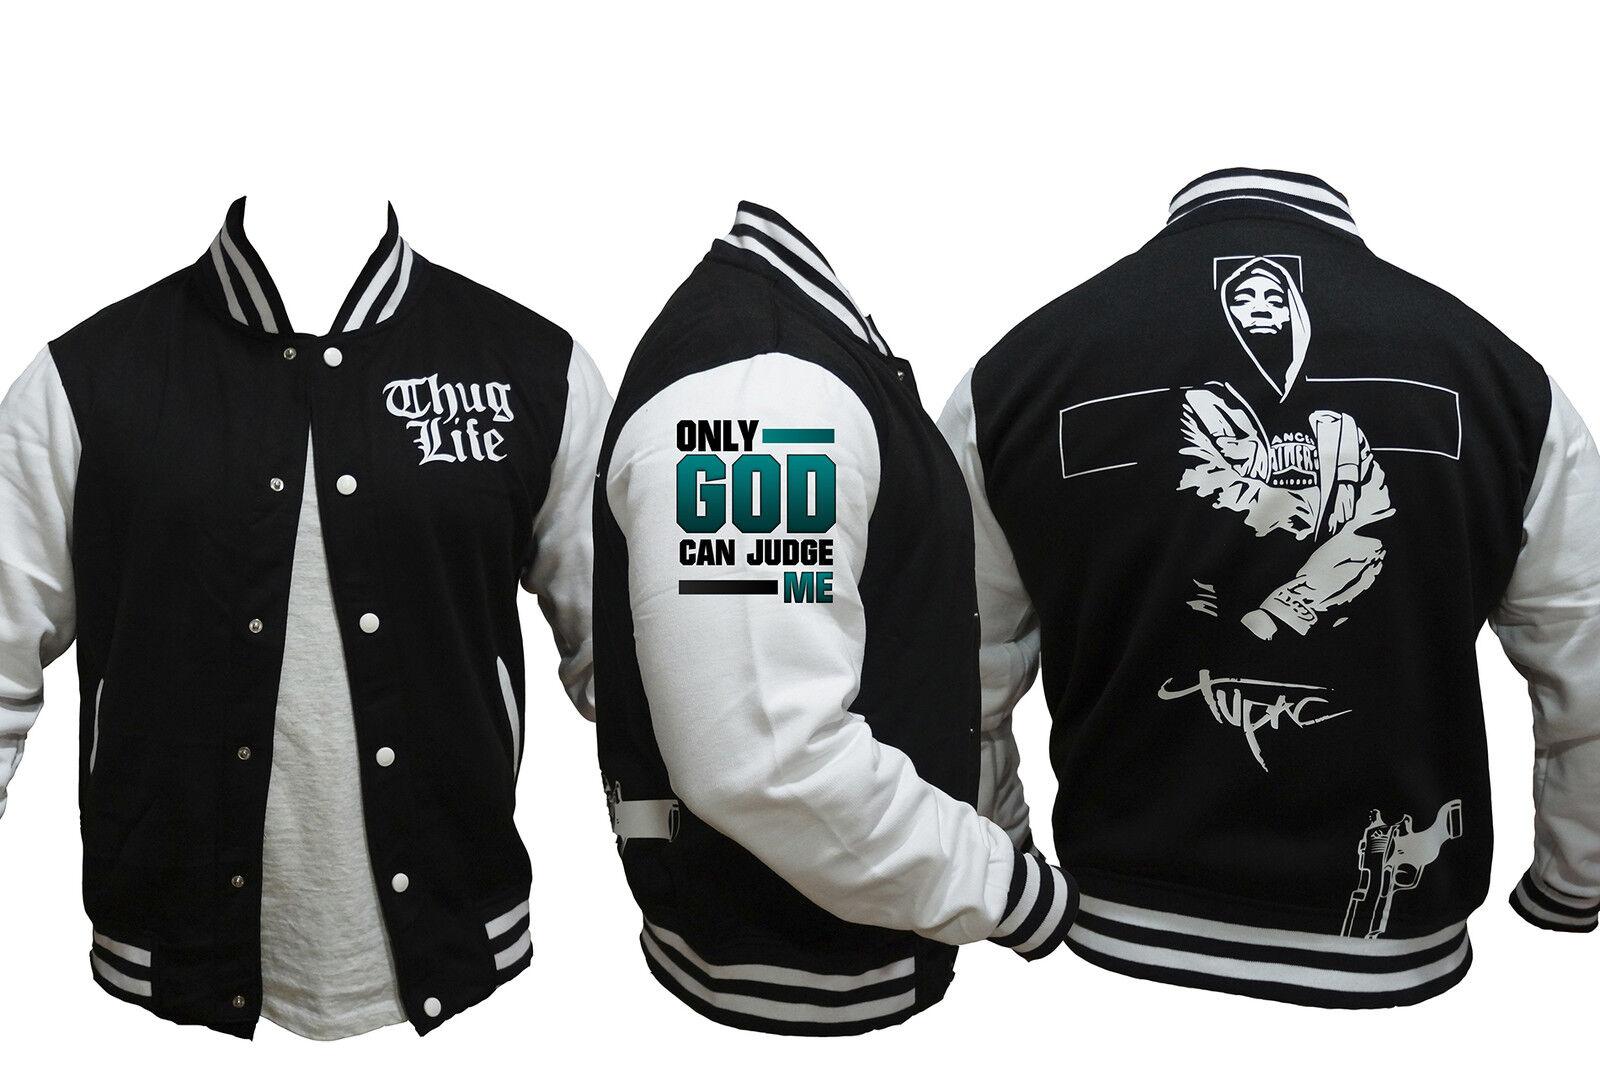 Chaqueta Tupac Shakur Rap Hip Hop  2pac Exclusiva   Felpa perchada